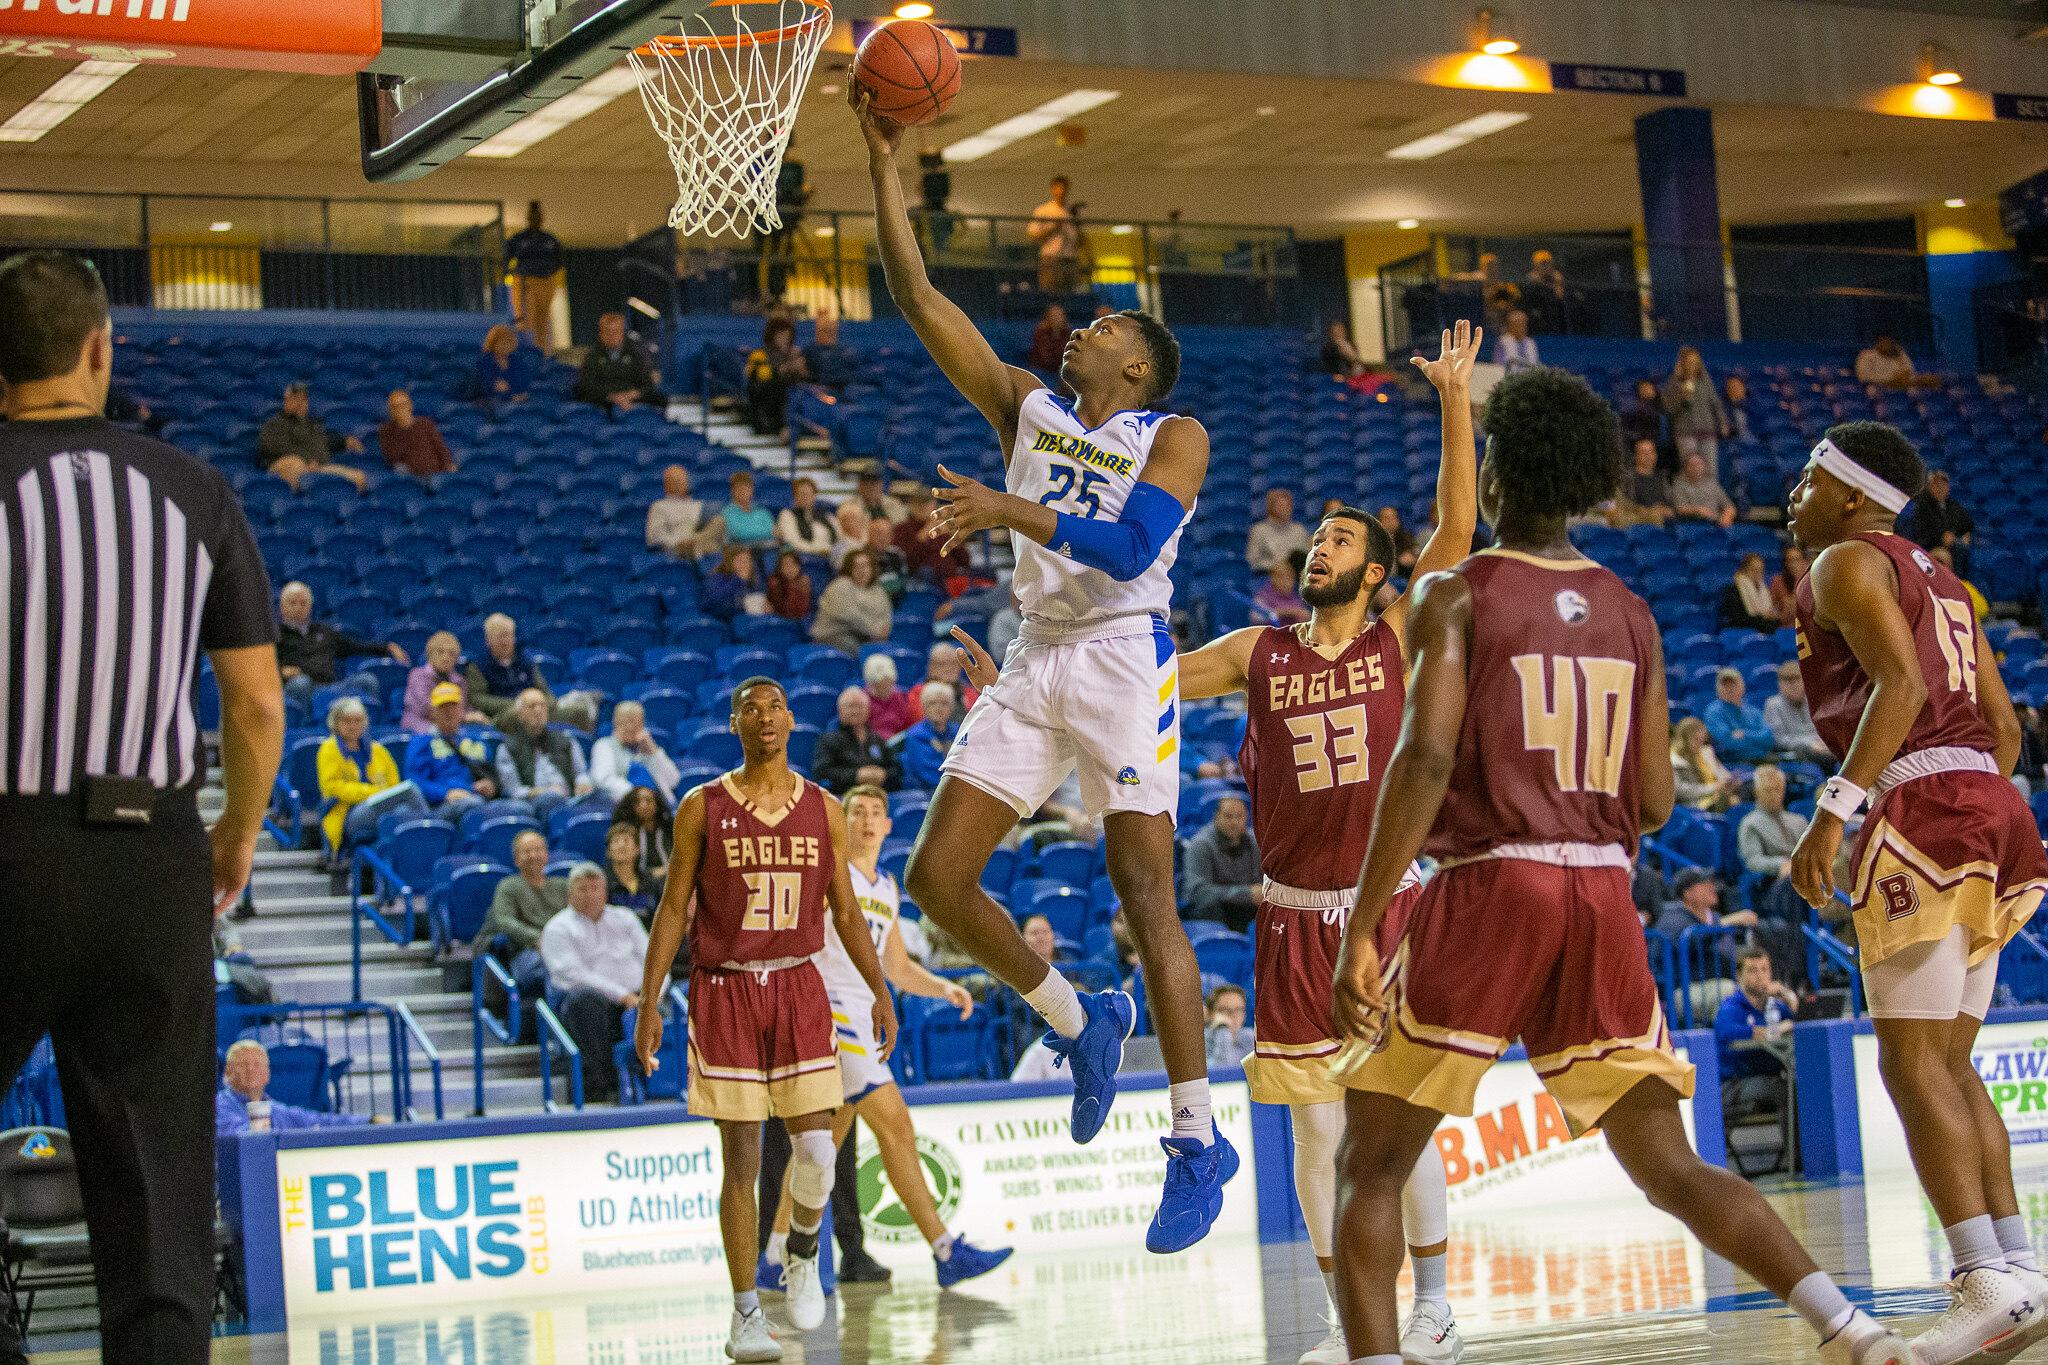 Delaware basketball attendance is rising, but still needs work